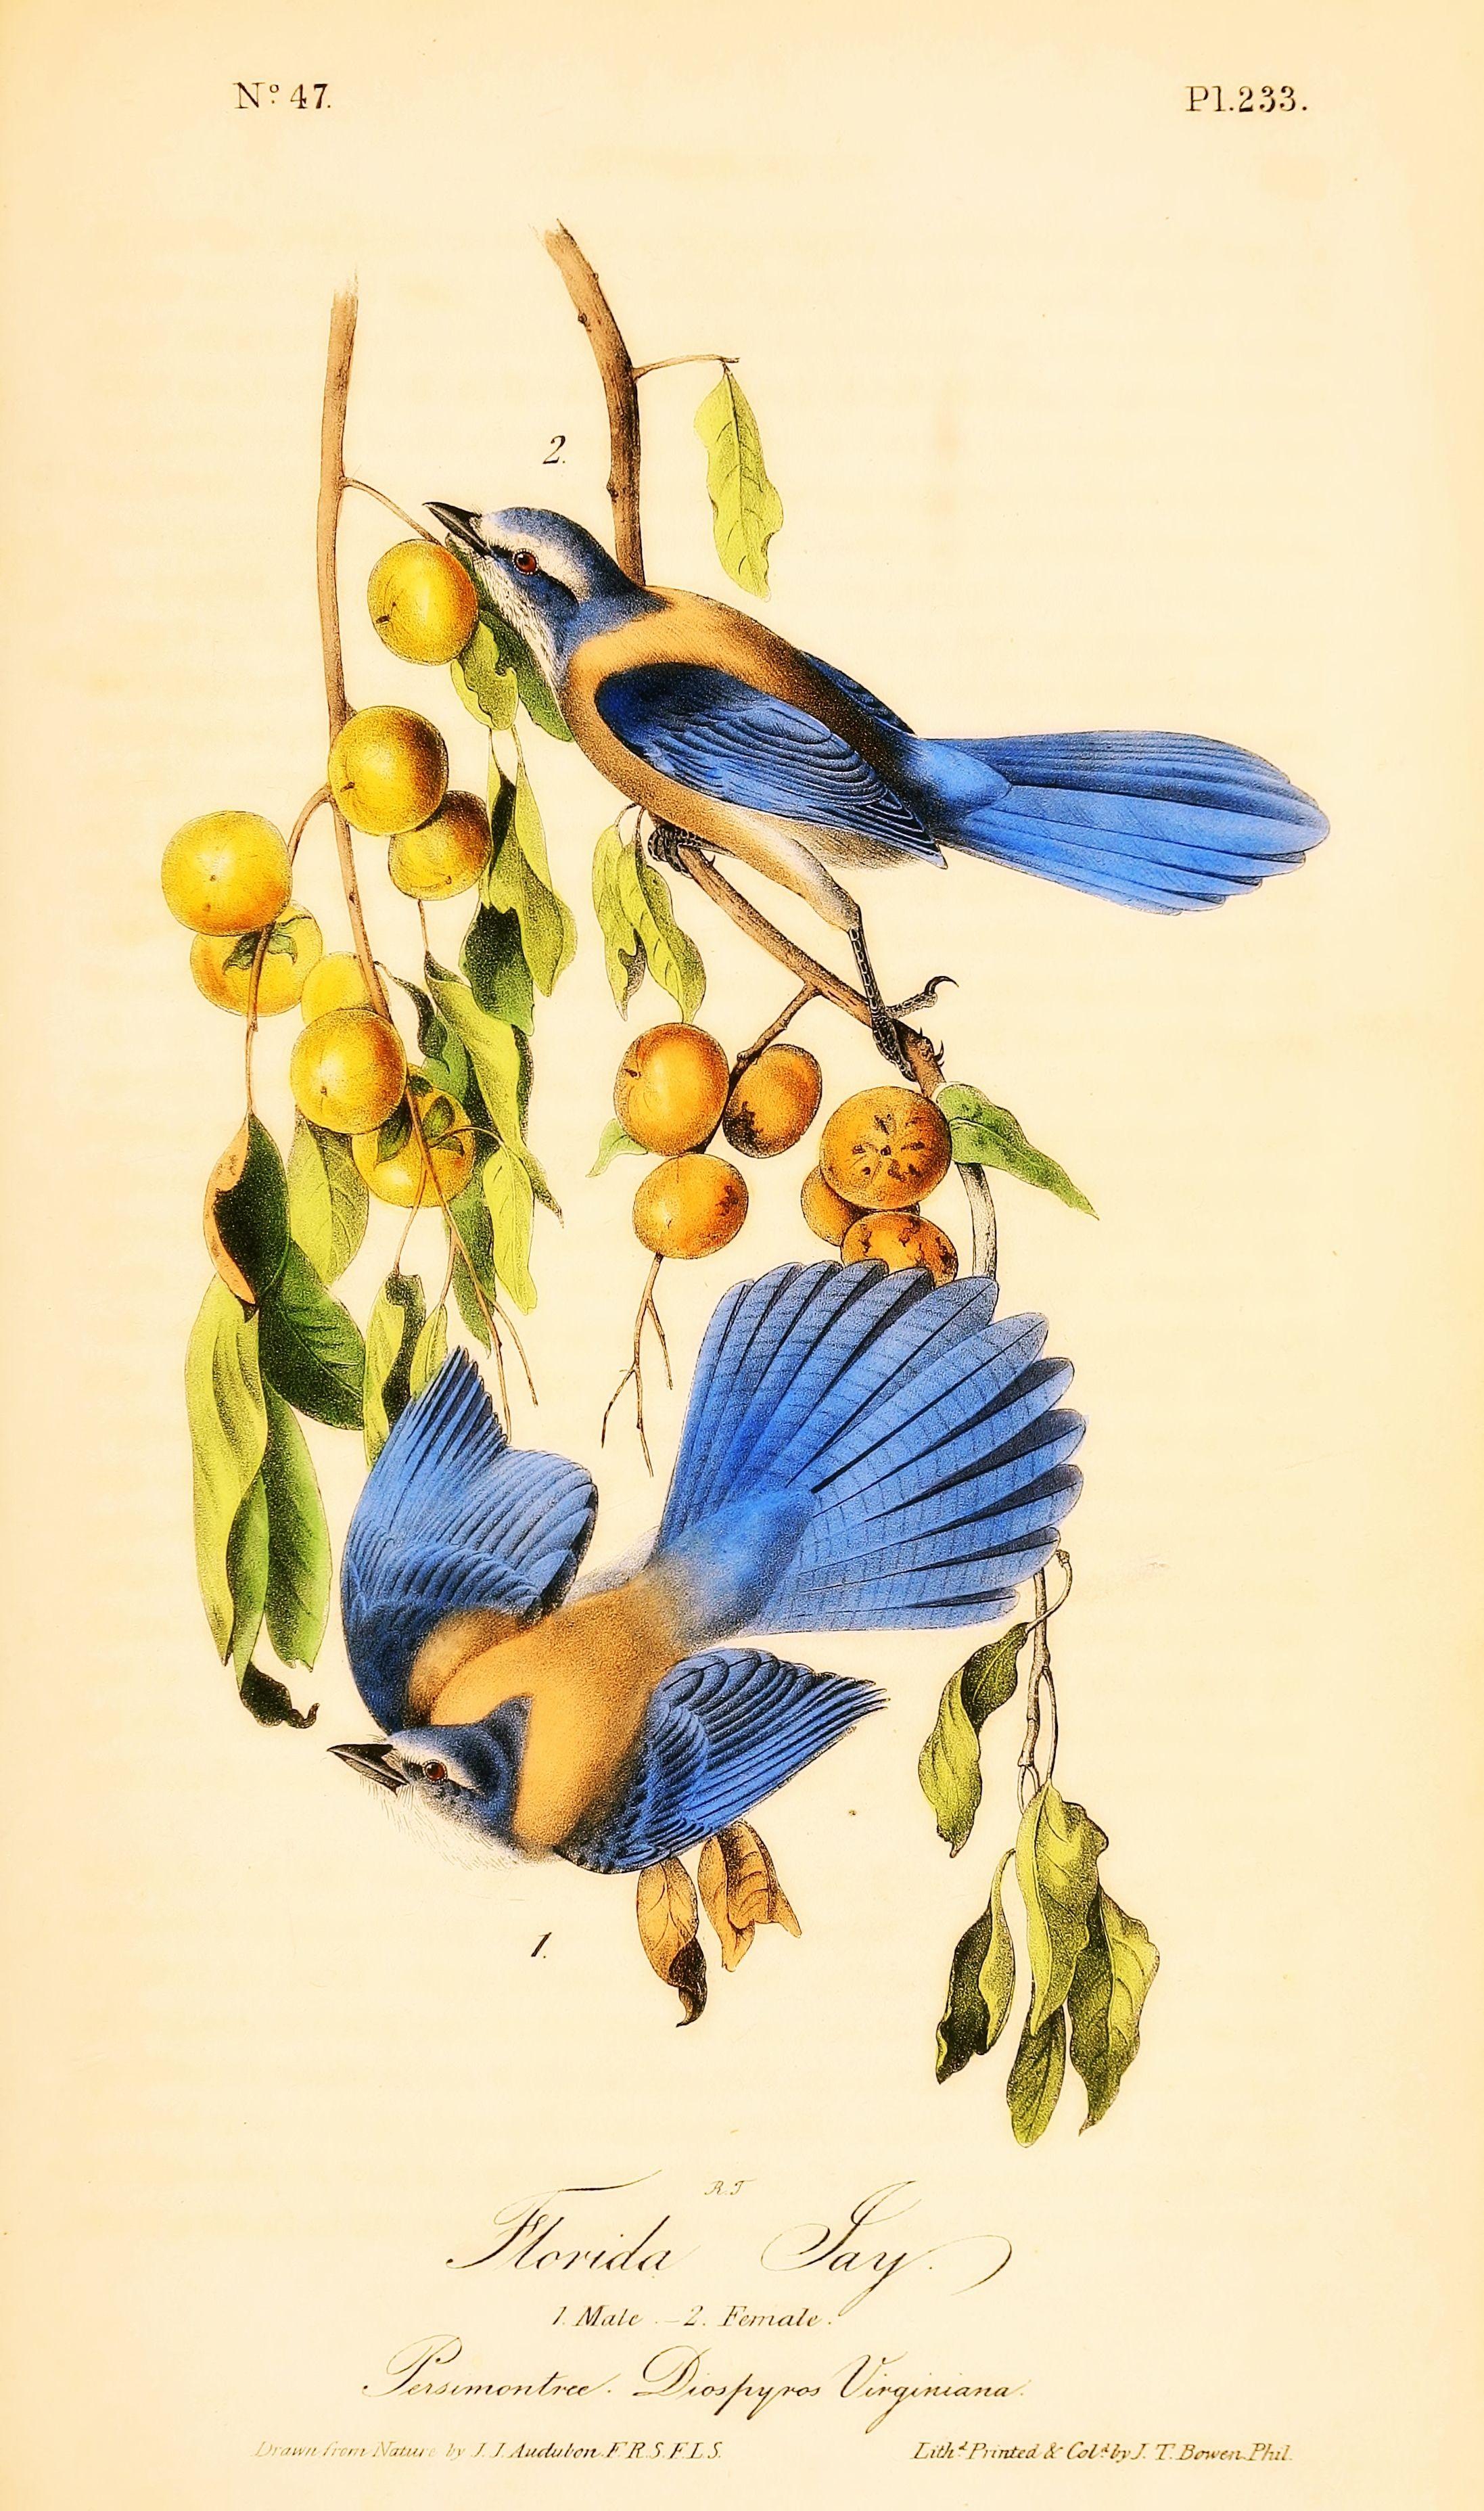 Pin de javier magdaleno en Birds | Pinterest | Pájaro, Ilustracion ...